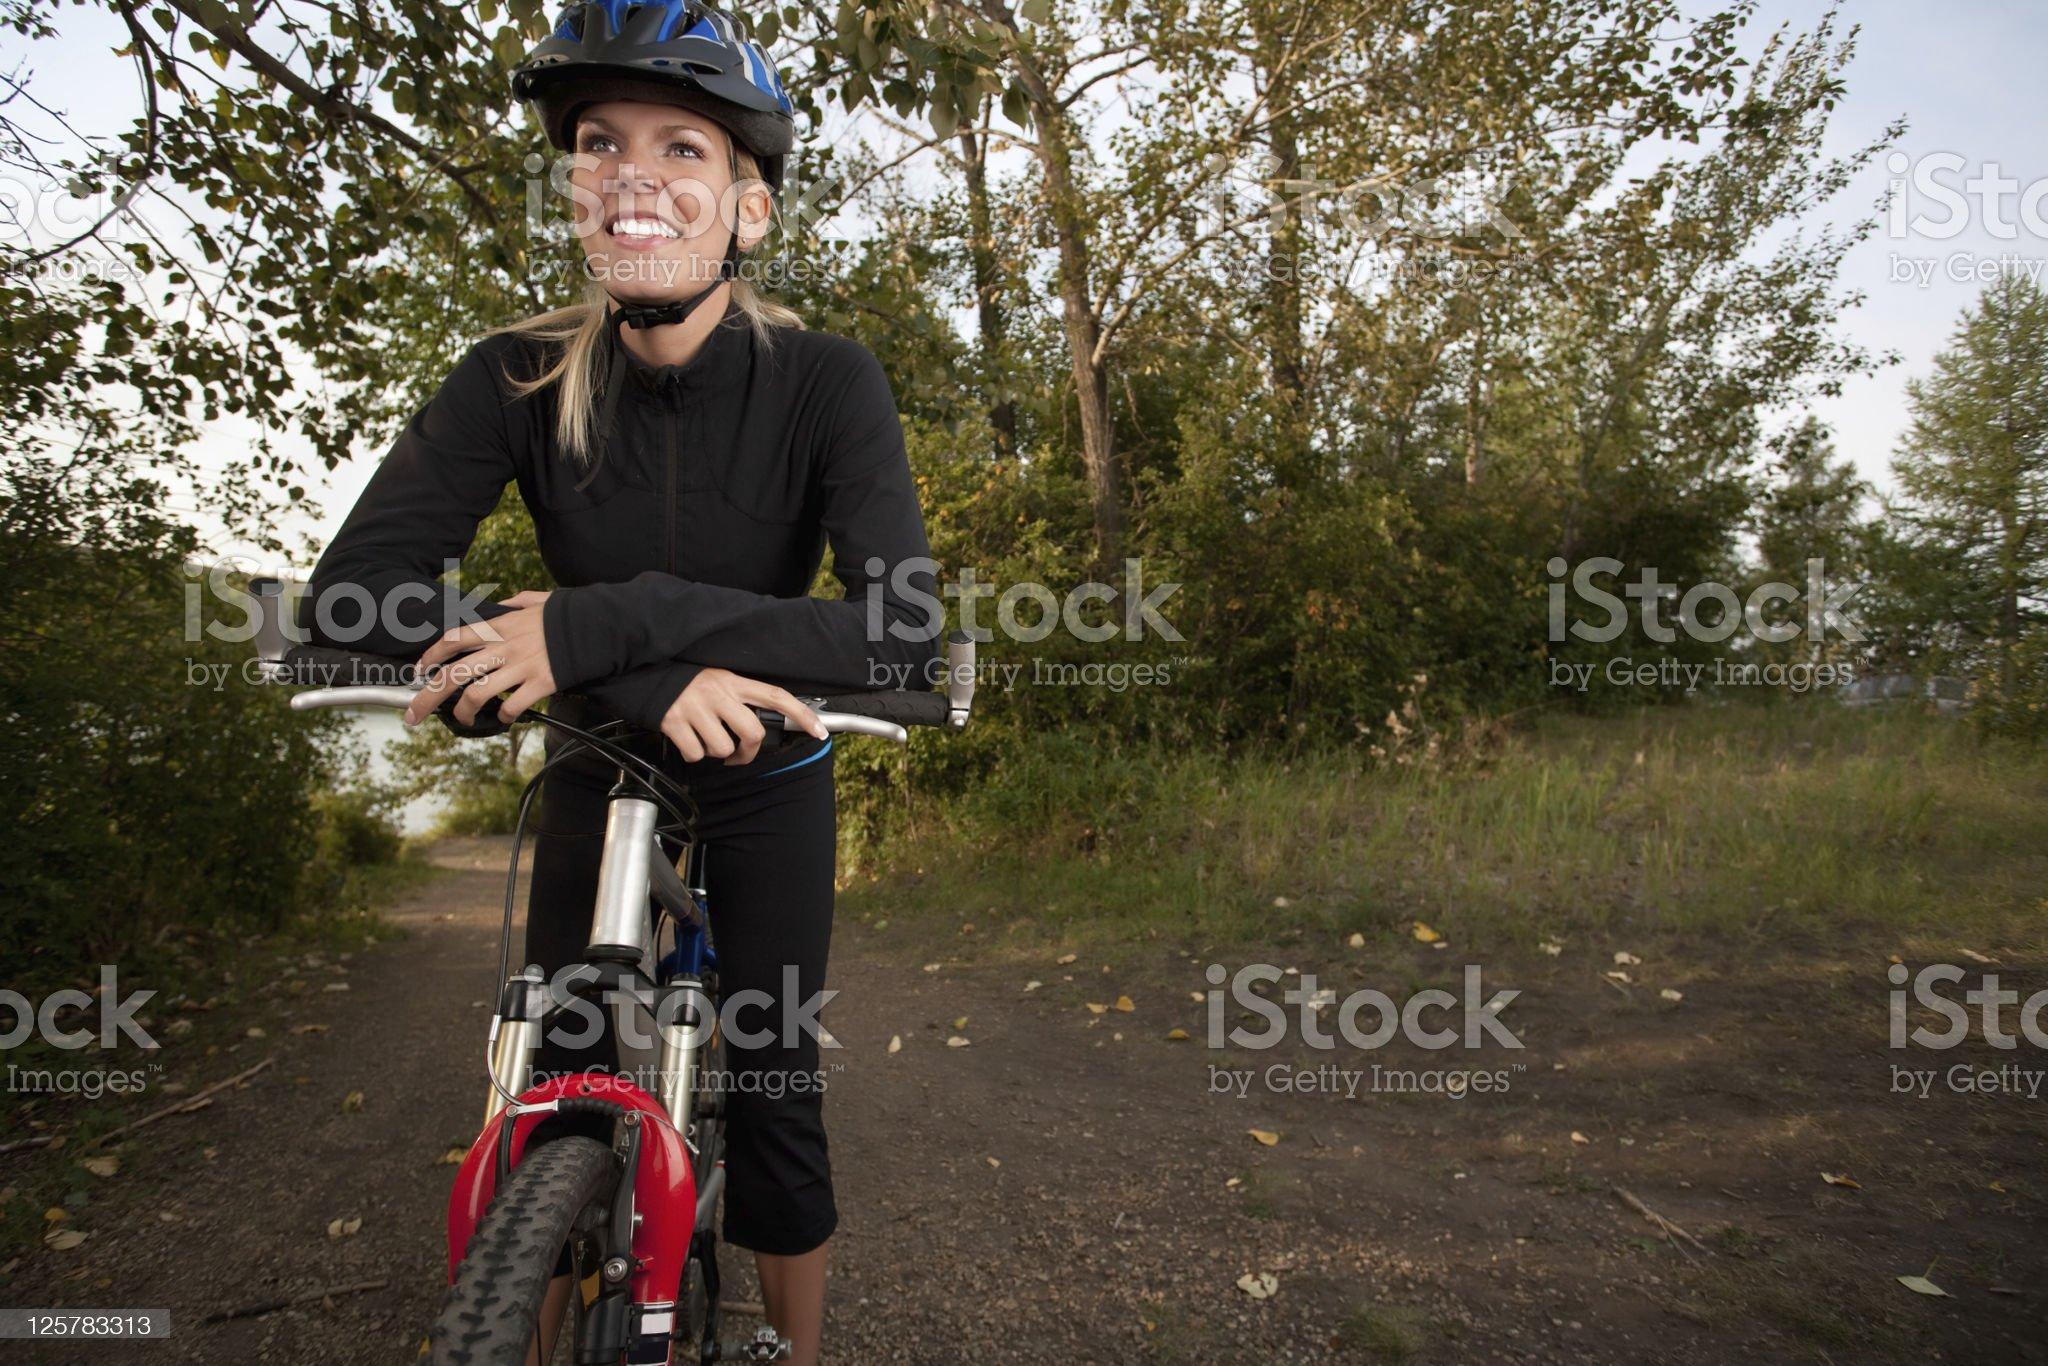 Smiling young woman mountain biking royalty-free stock photo